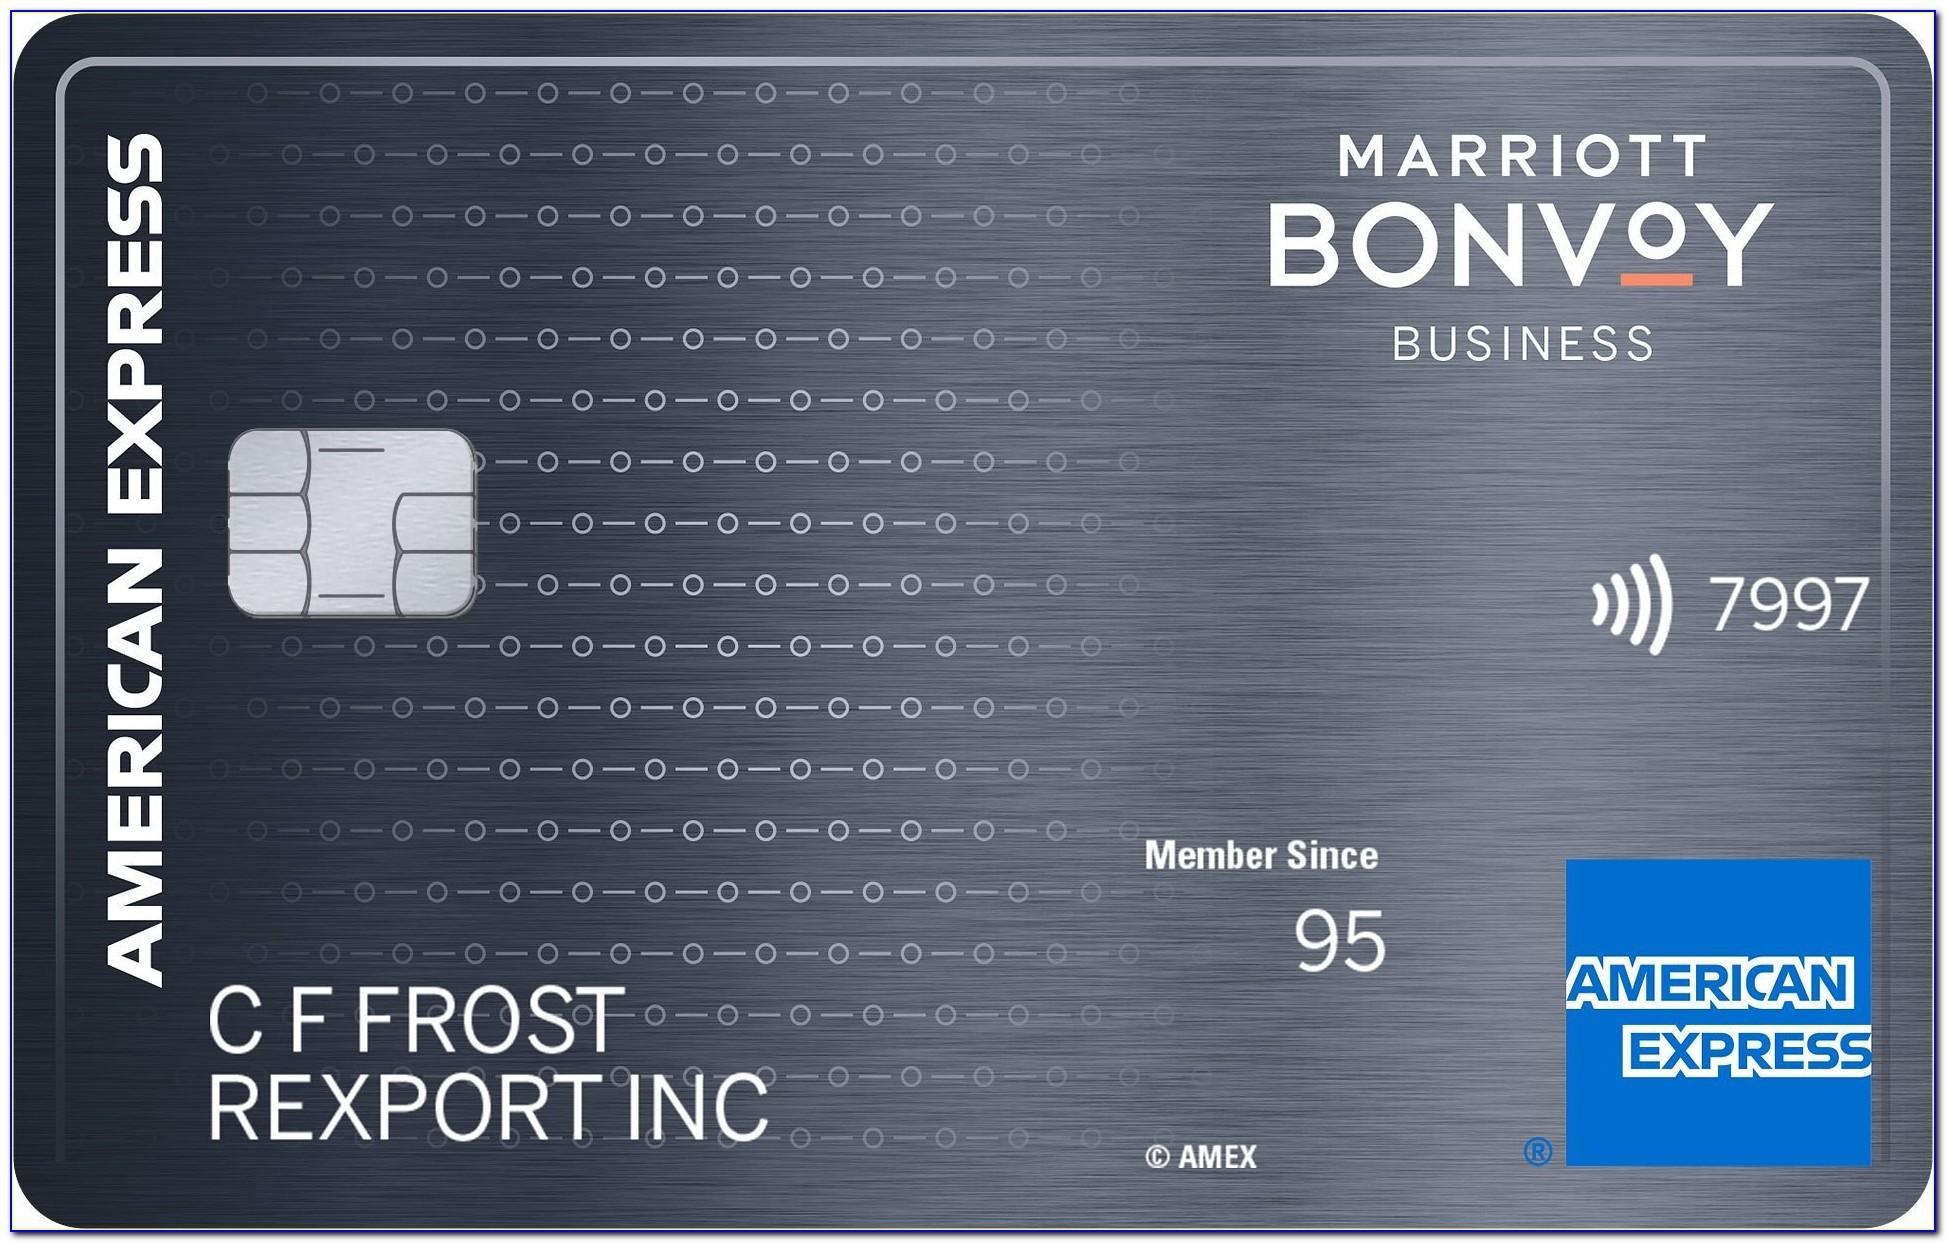 Chase Business Card Bonus